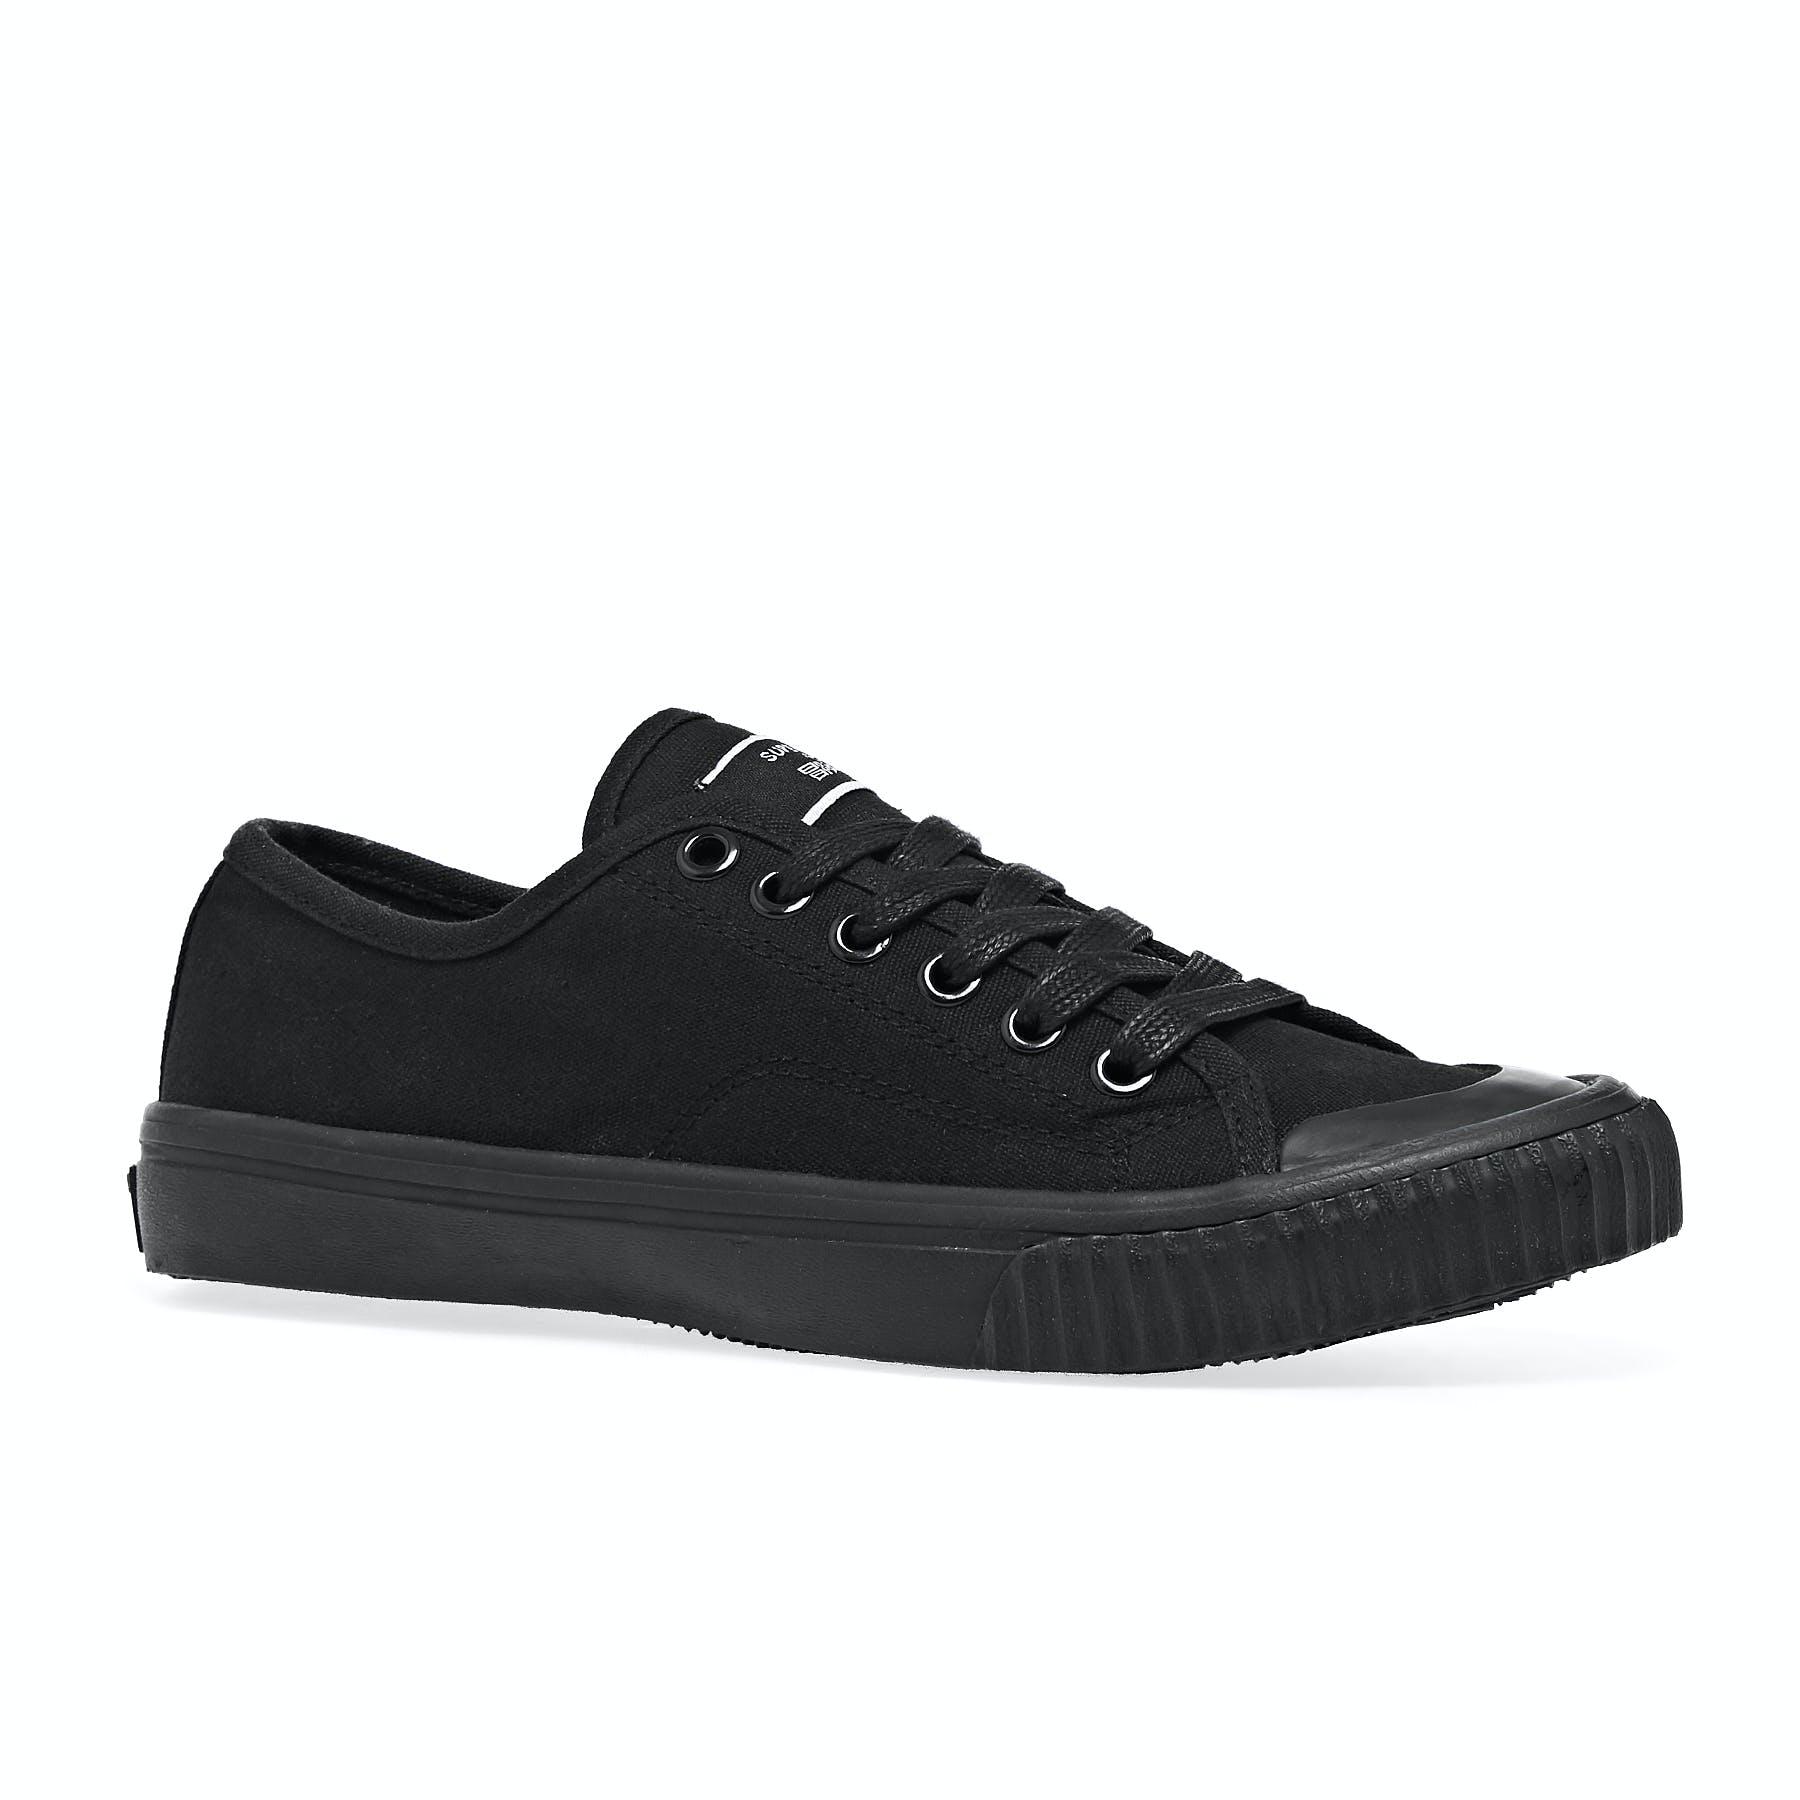 Superdry Low Pro 2.0 Femme Chaussures Chaussures-Noir Toutes Tailles